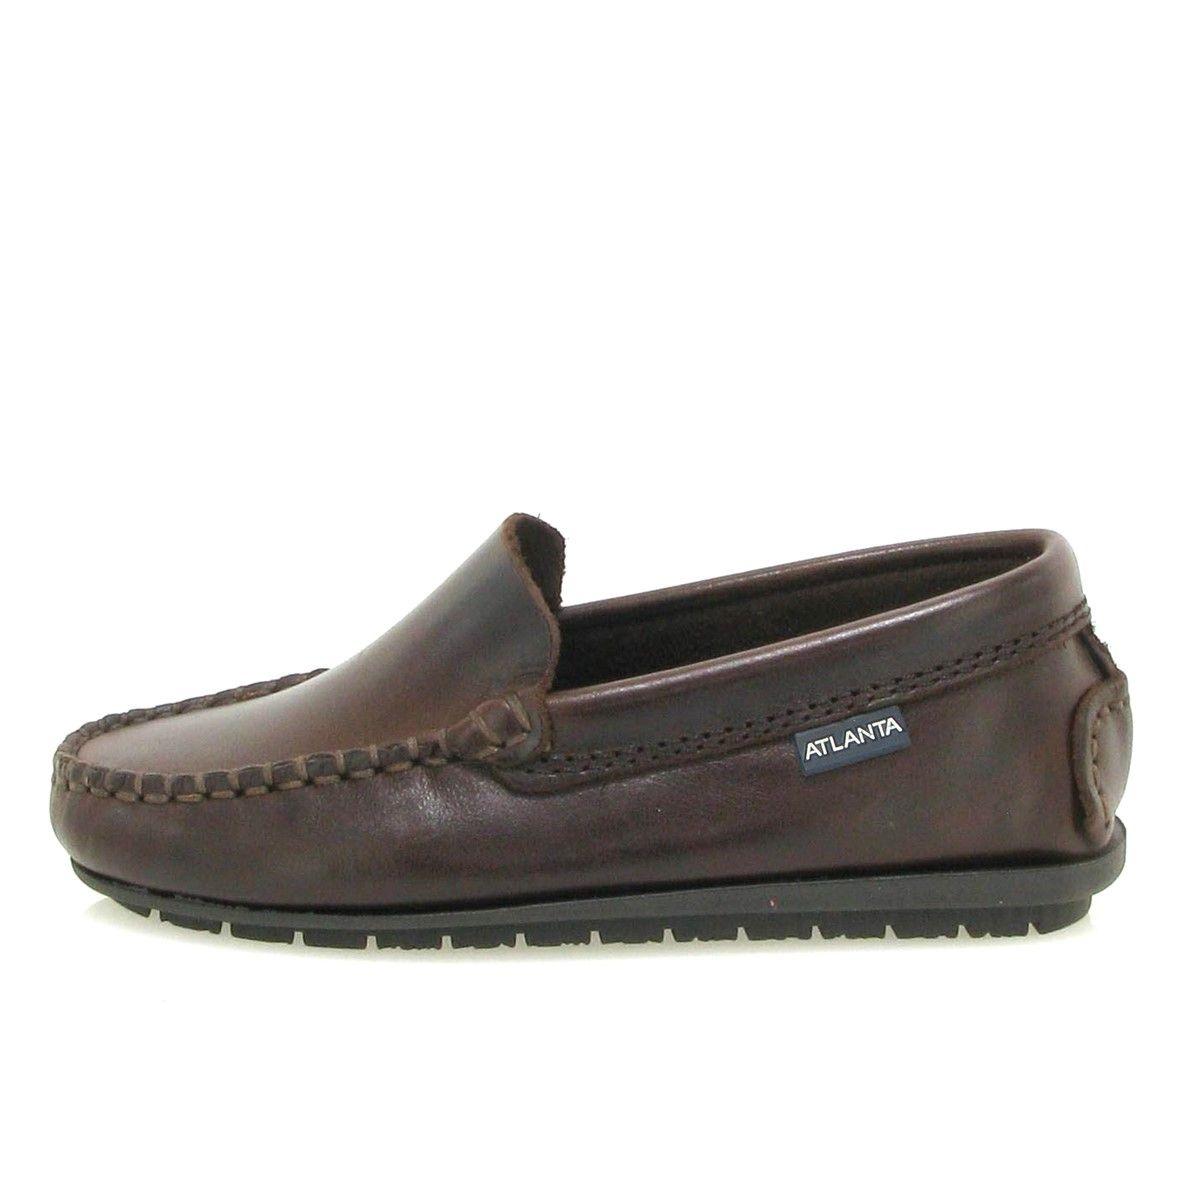 Chaussures mocassins simples en cuir rustique